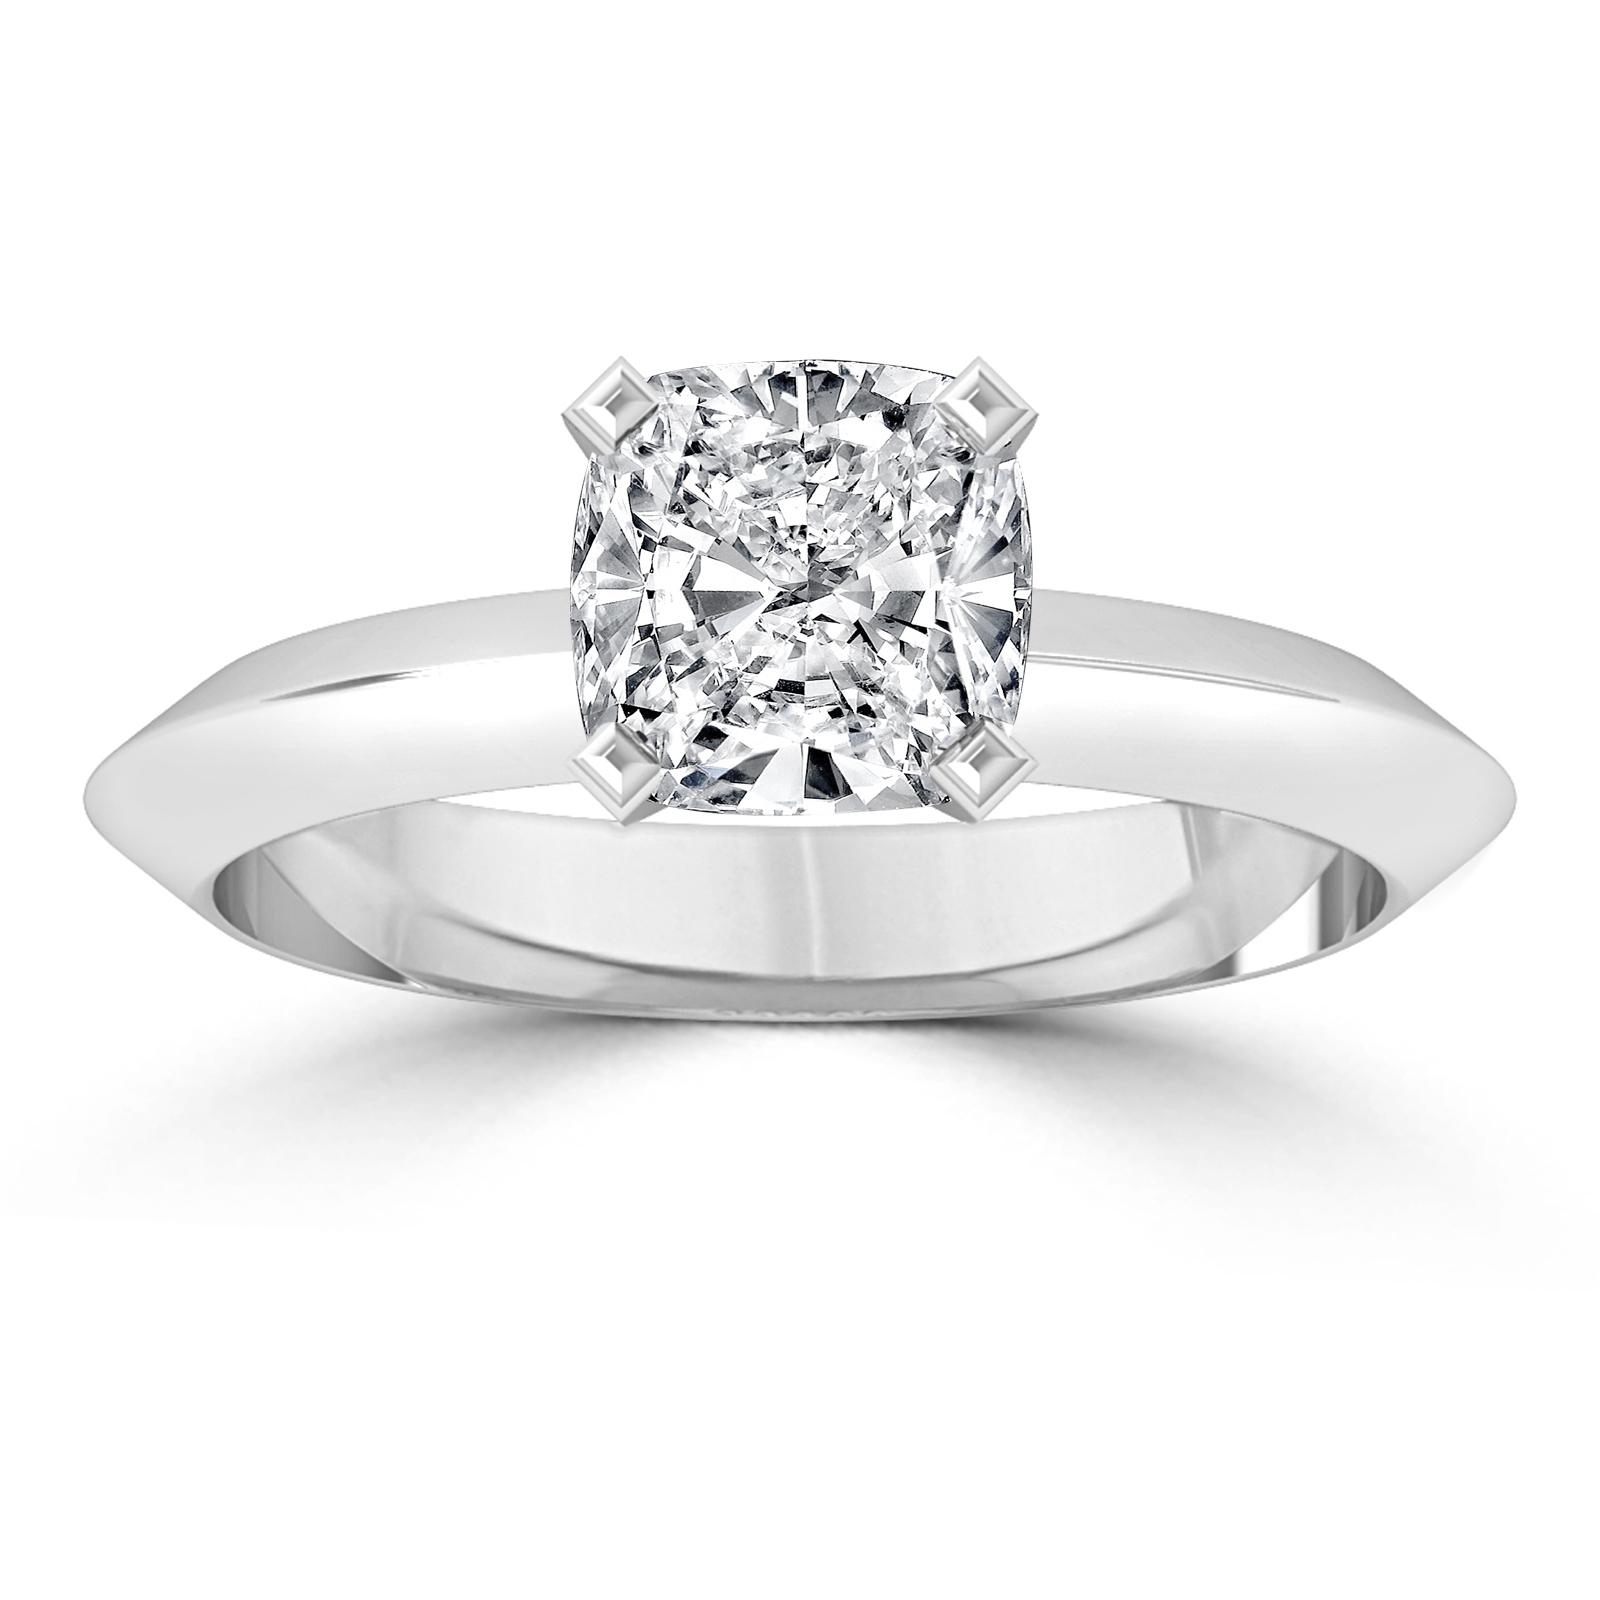 1 ct valentine 39 s enhanced diamond engagement ring cushion. Black Bedroom Furniture Sets. Home Design Ideas